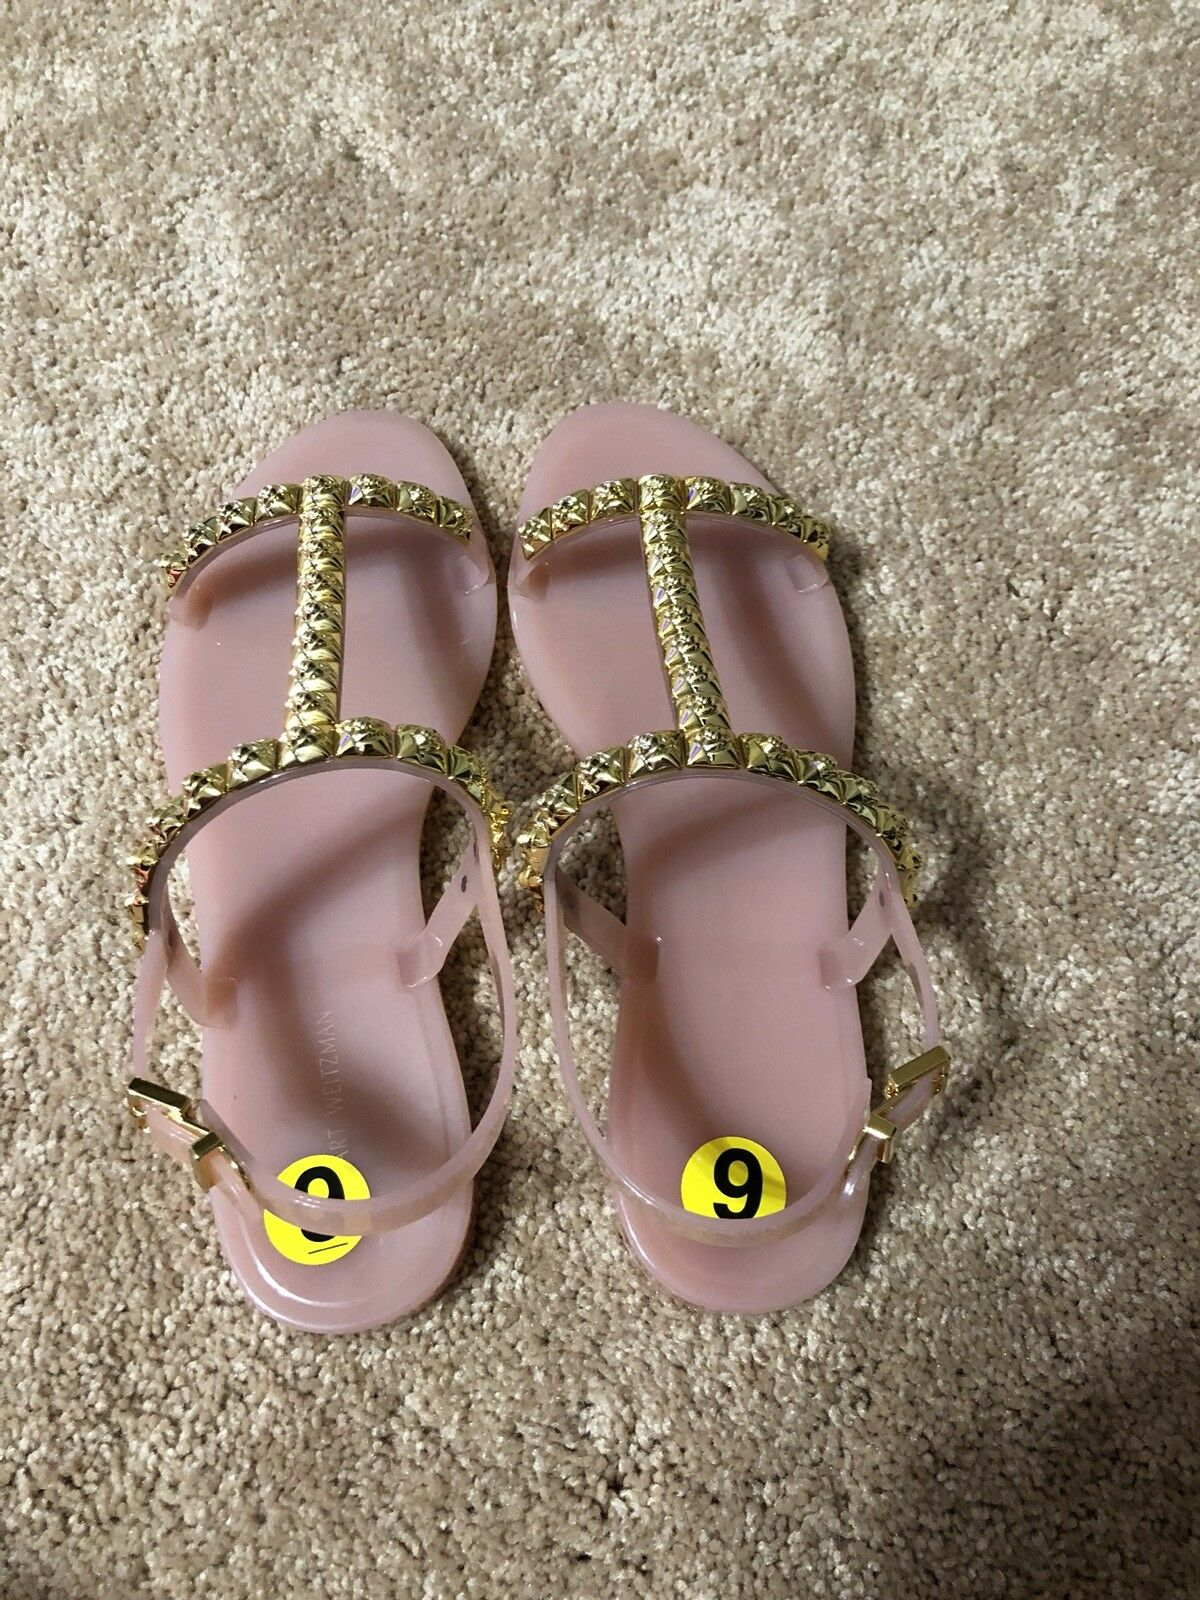 Stuart weitzman sandals size 9 brand new